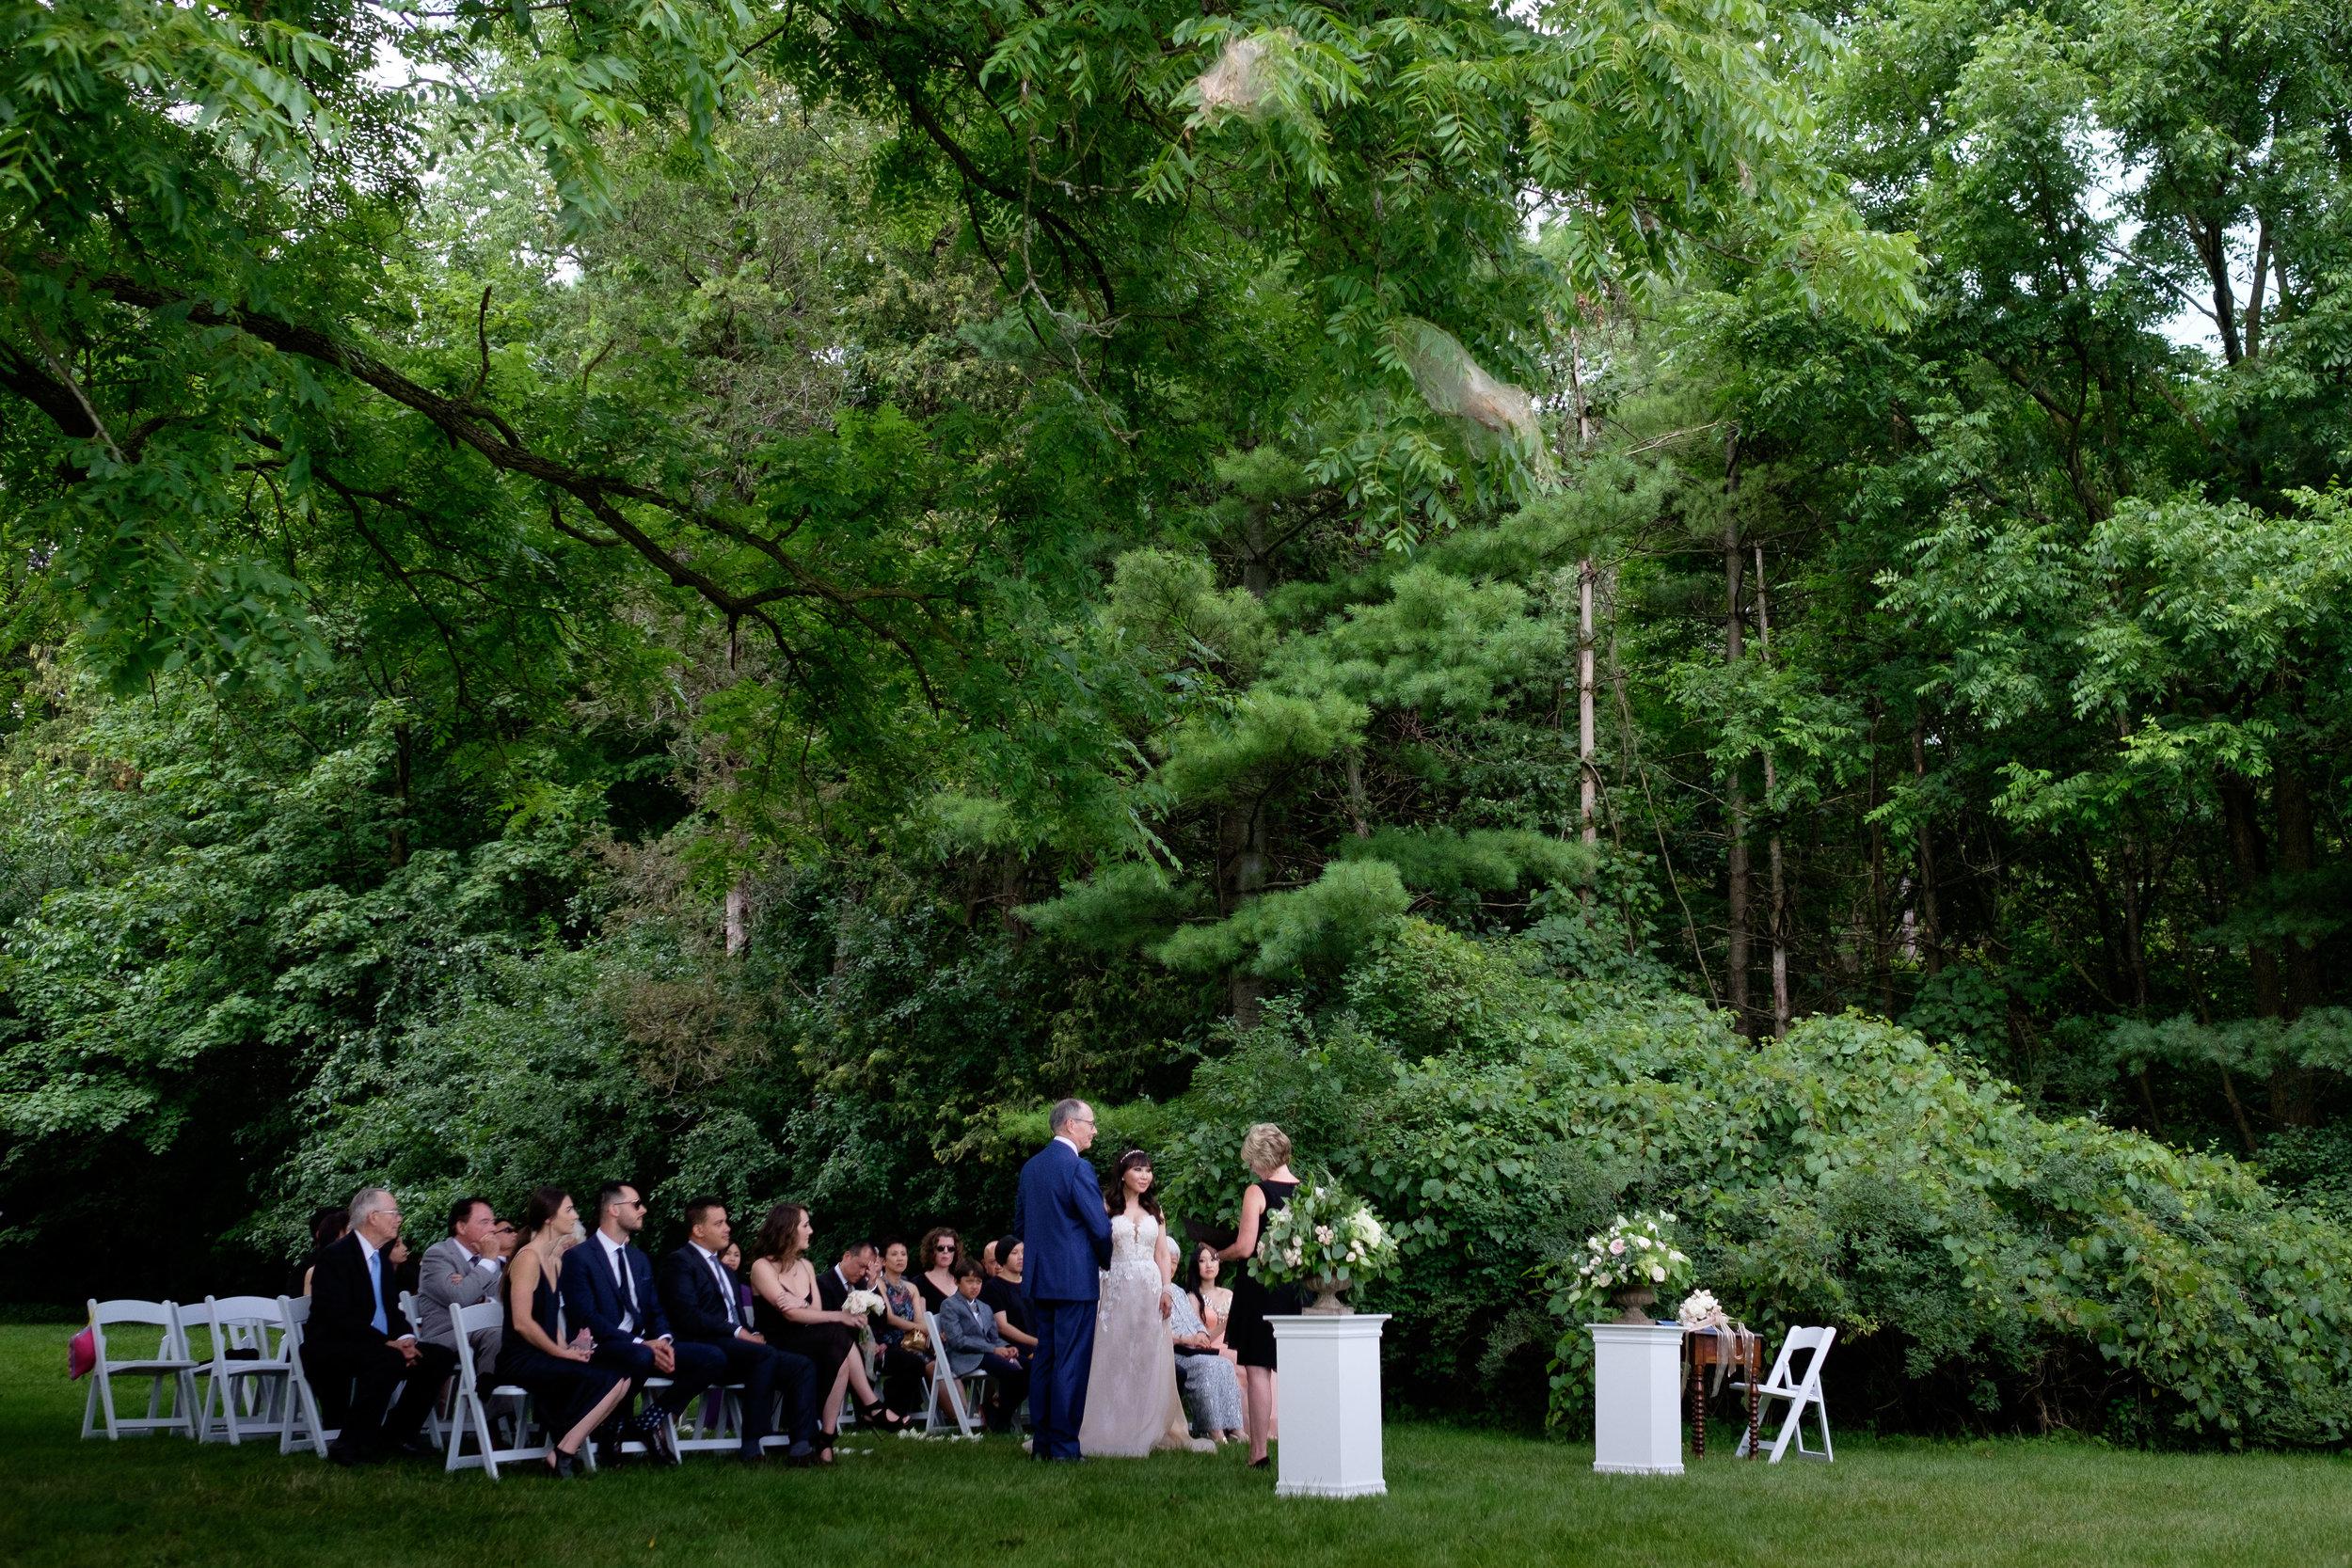 langdon-hall-orchard-wedding-ceremony.jpg